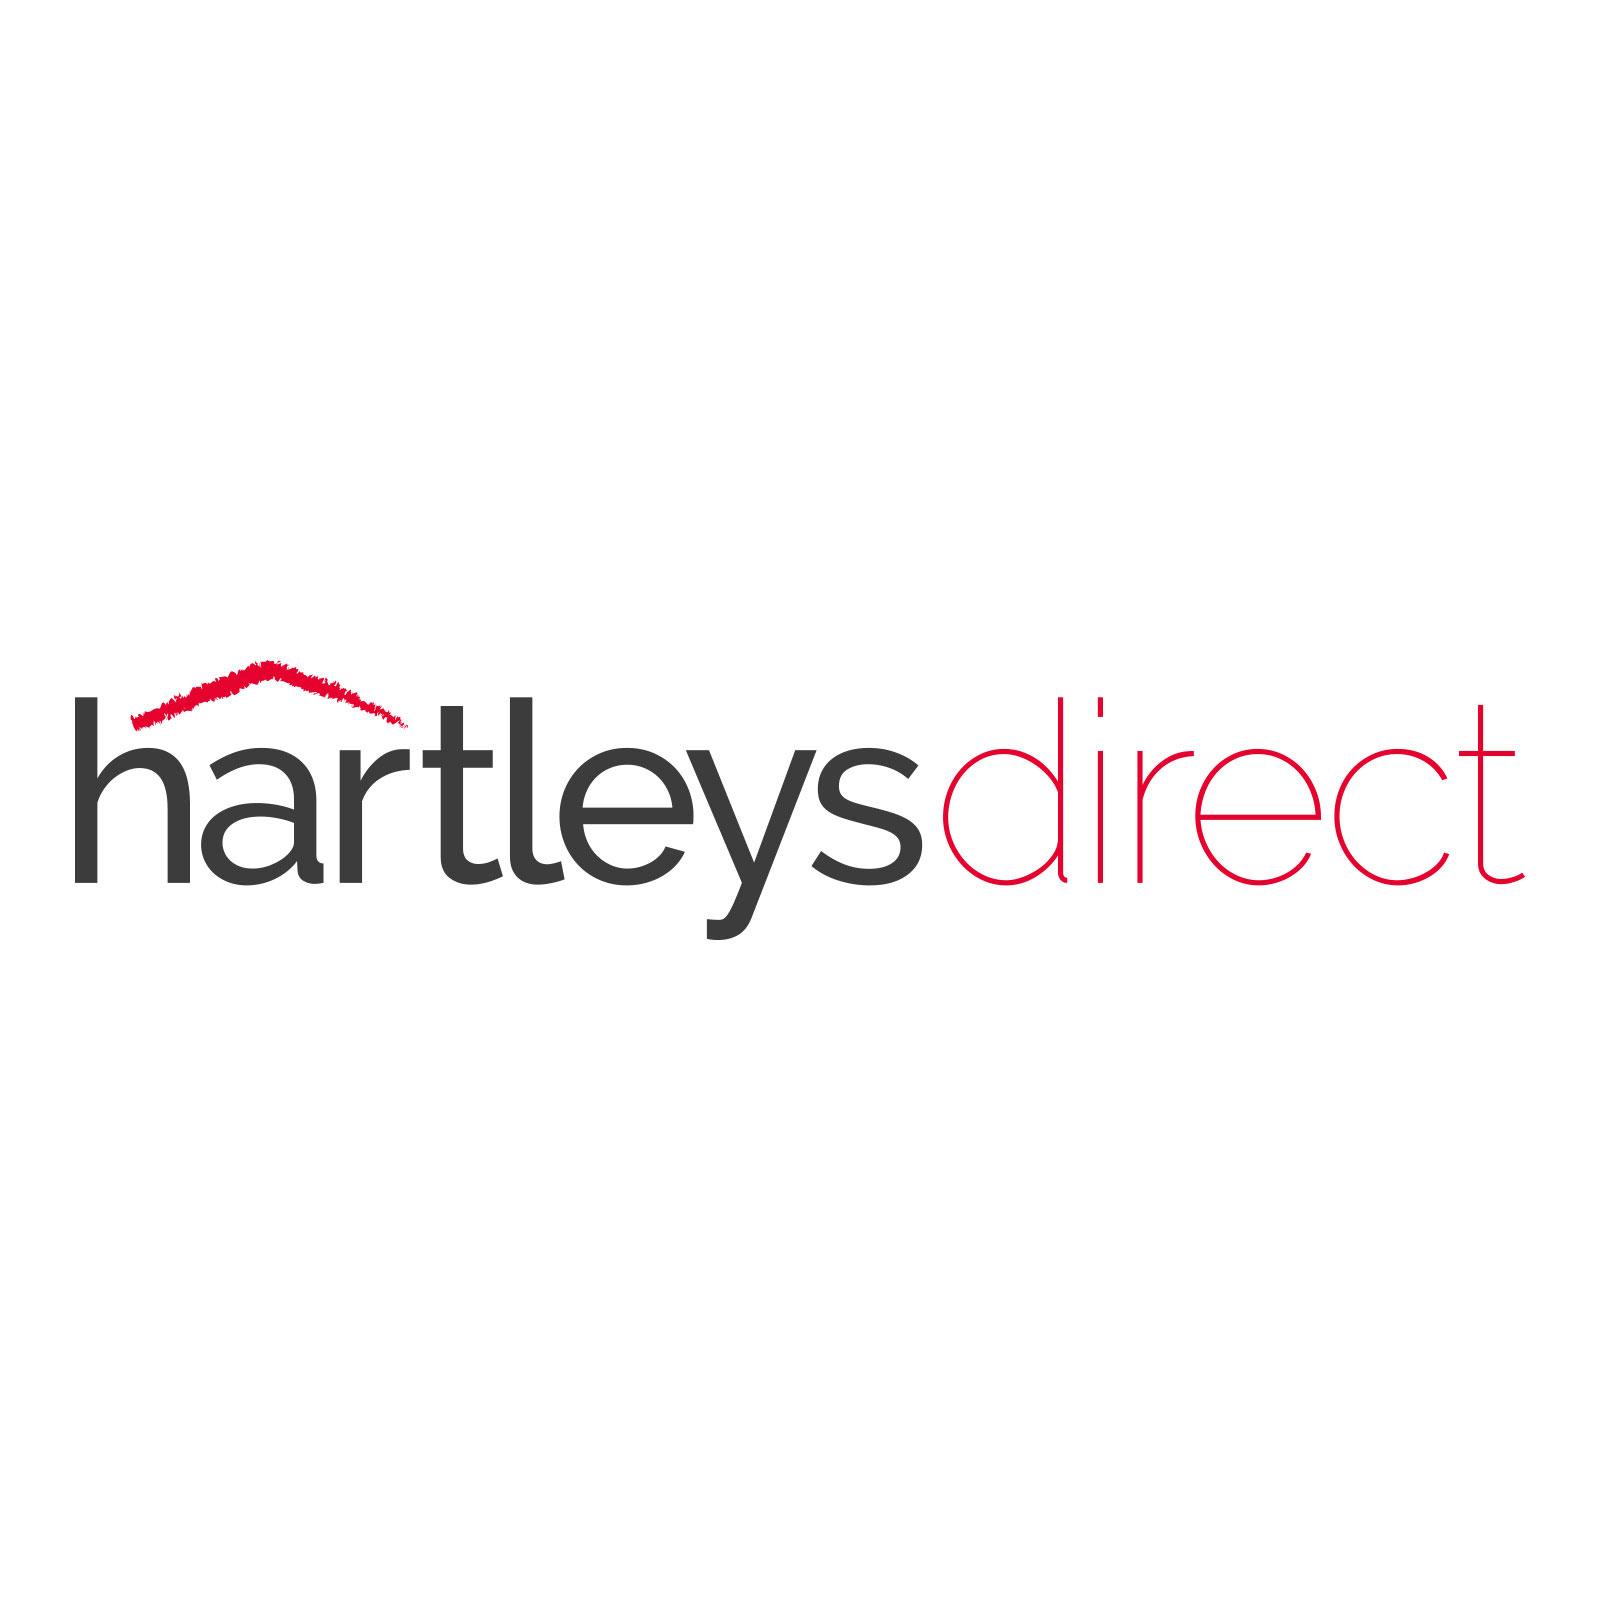 Hairpin Prism Shelf Brackets Shelf Supports Hartleys